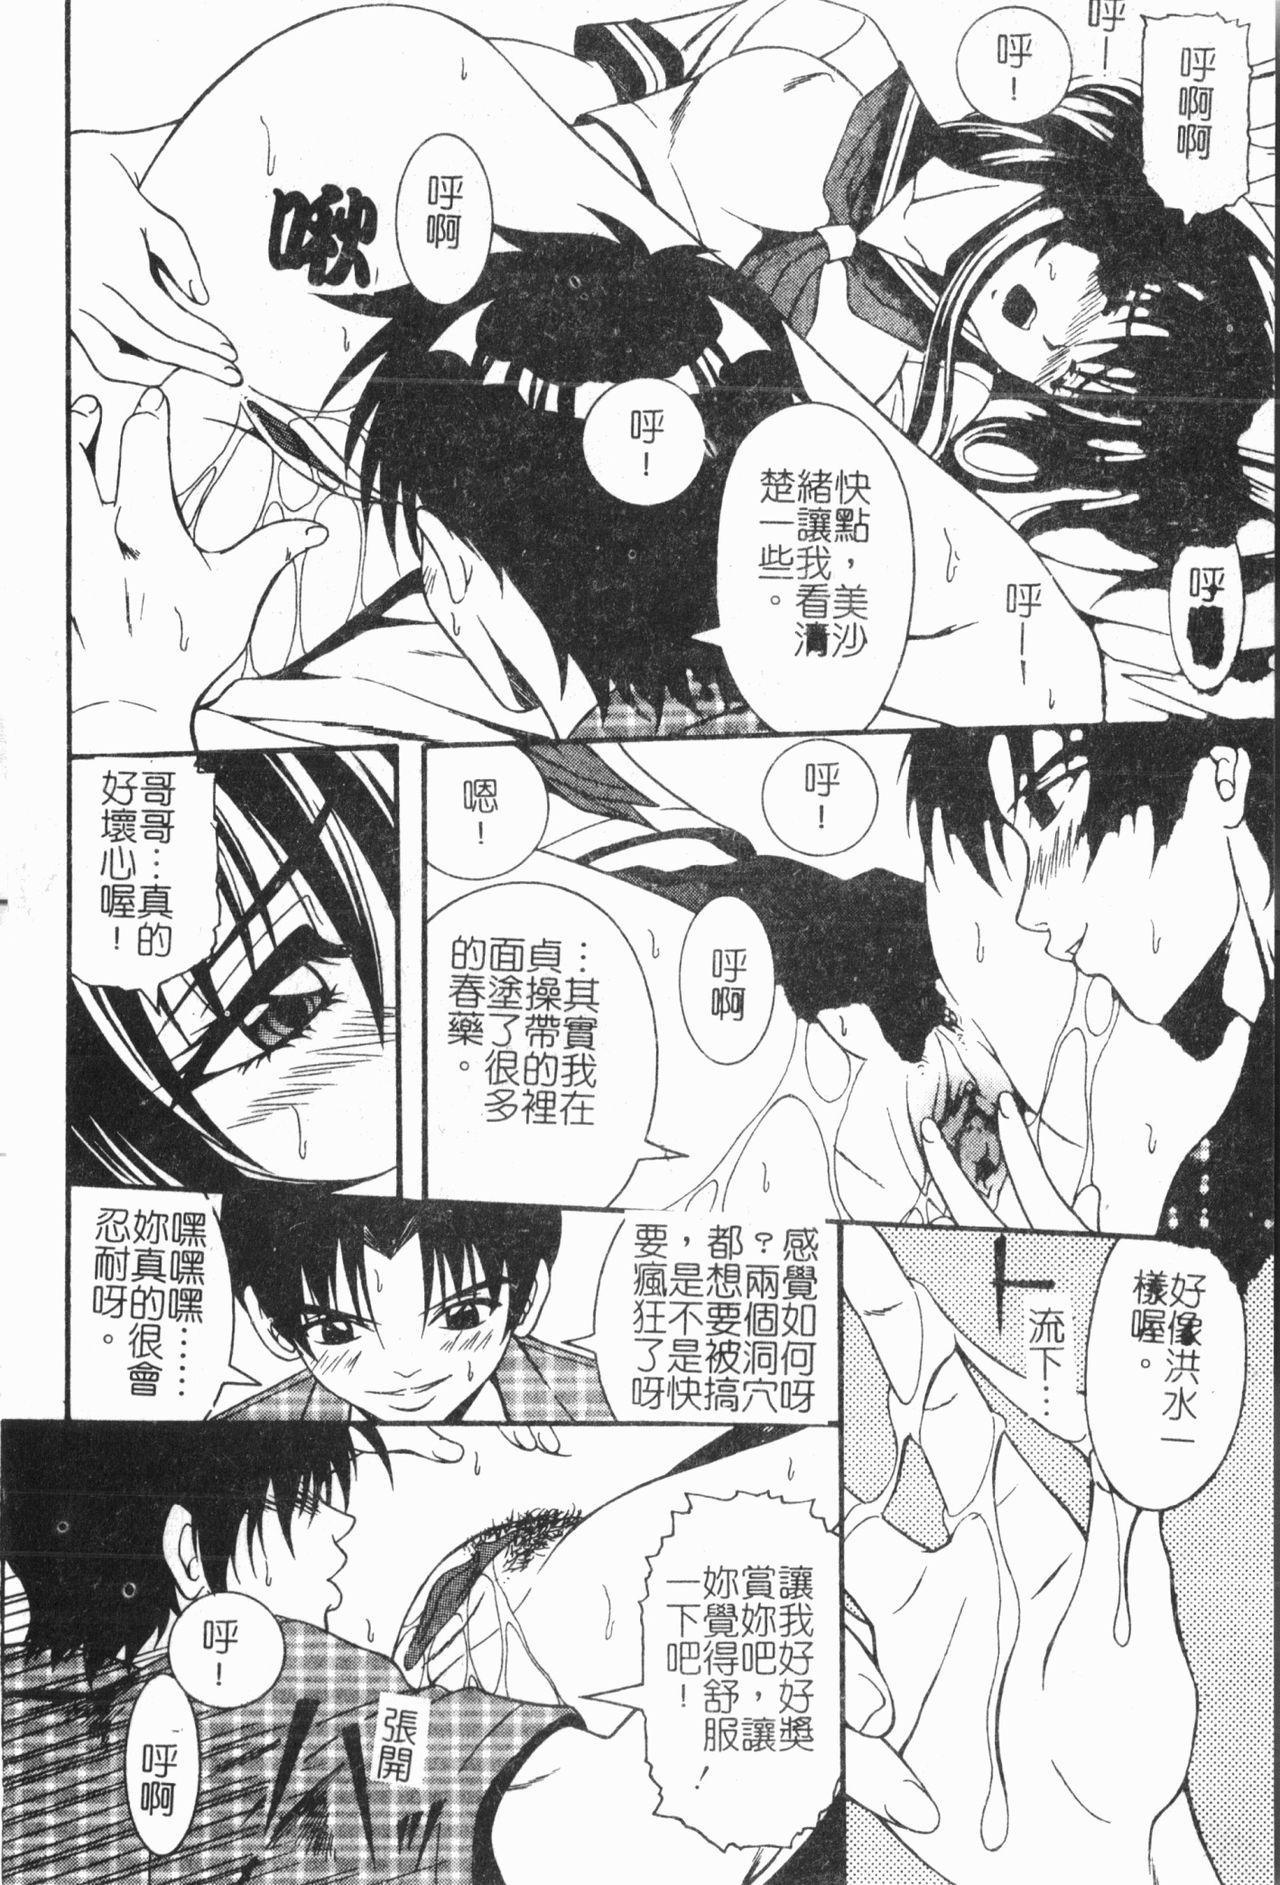 Imouto Koishi 6 152